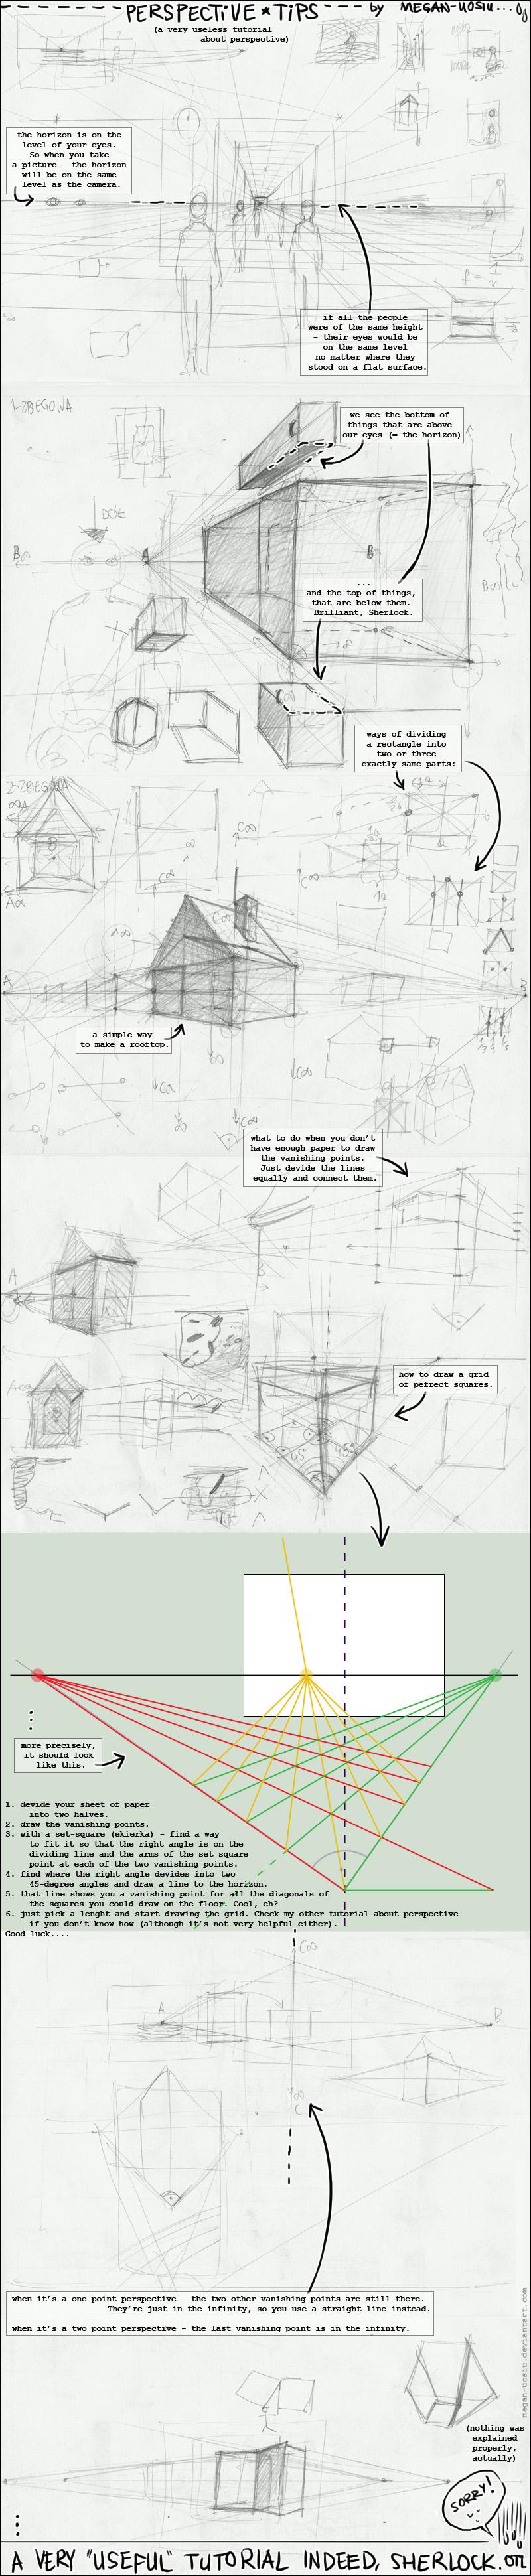 Perspective perhaps-tutorial 2 by Megan-Uosiu